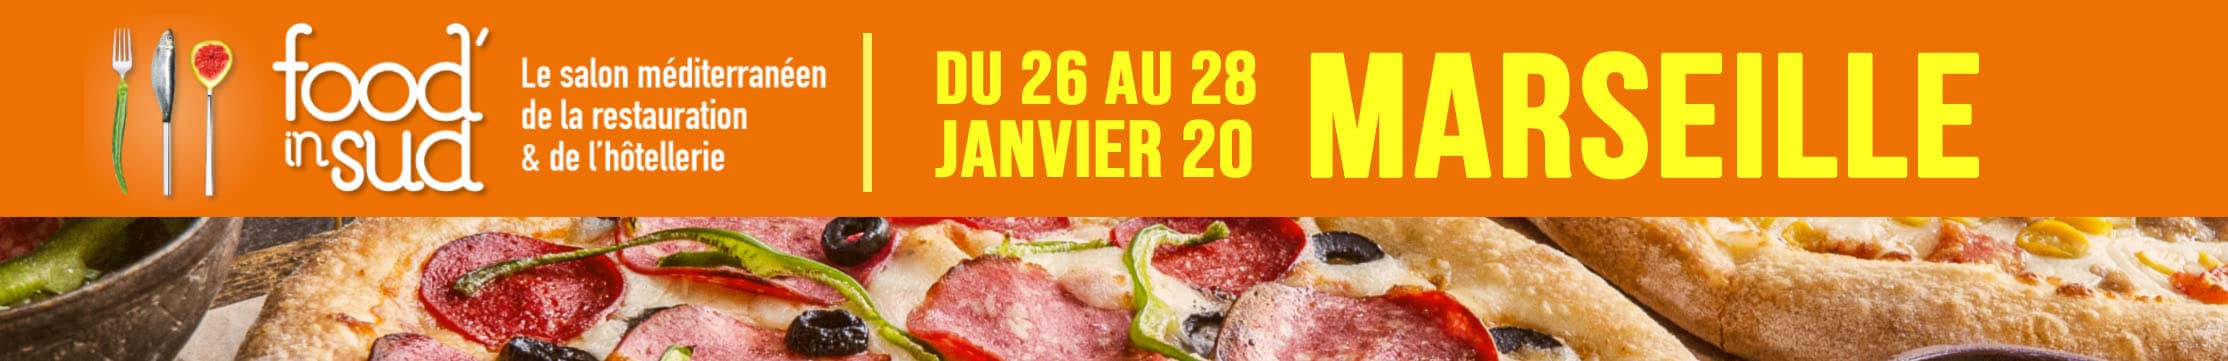 salon food'in'sud marseille 2020 pizzadoor stand